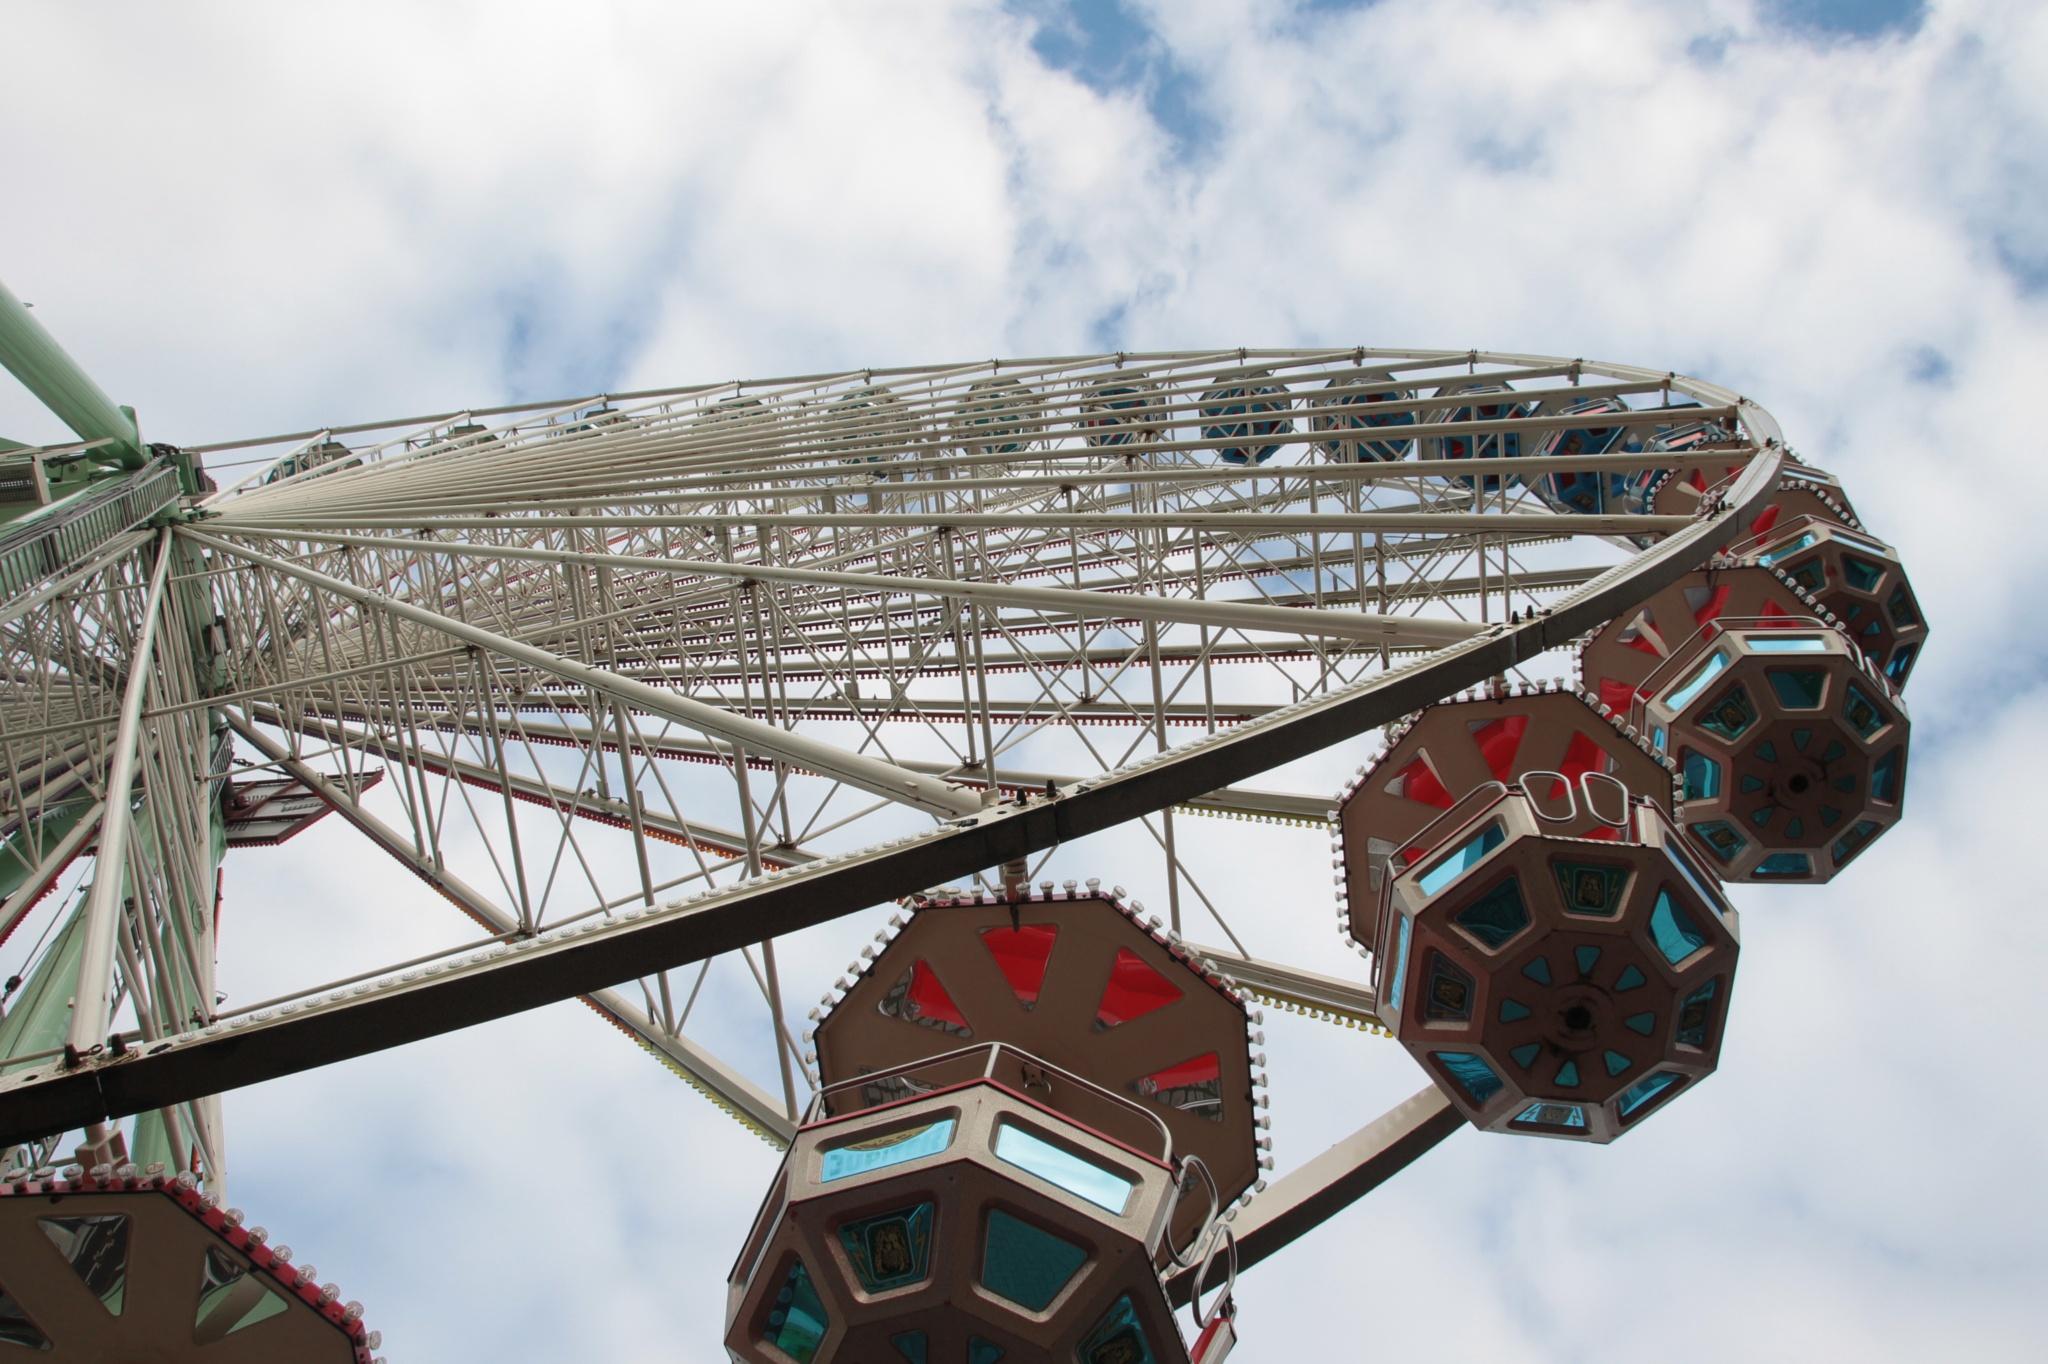 Ferris Wheel, no photoshop by Linus De Witte